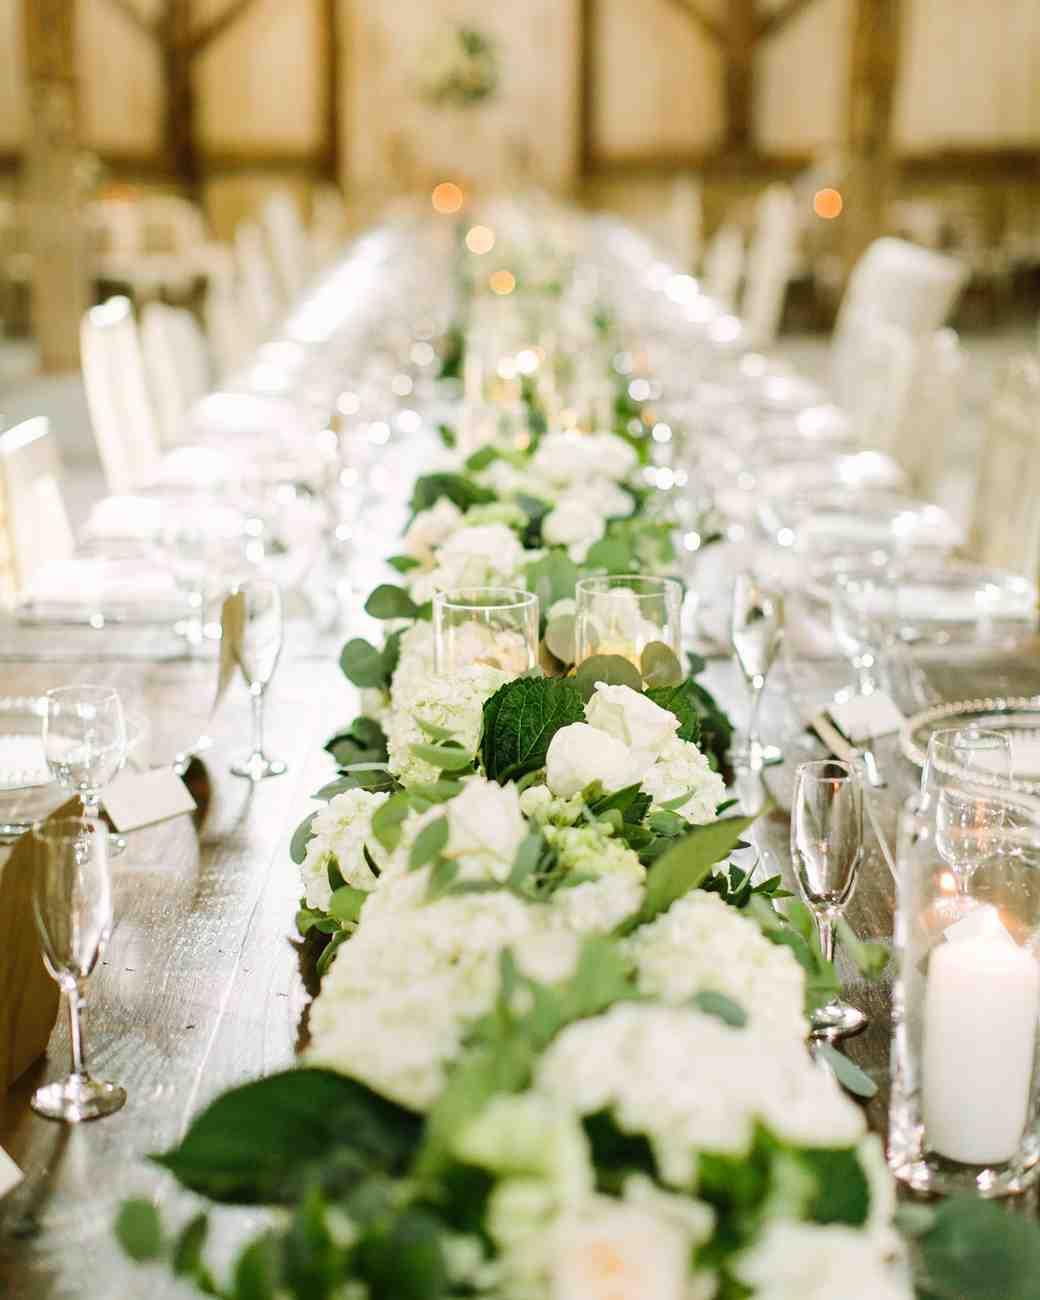 Summer Wedding Centerpiece Ideas: Stunning Summer Centerpieces Using In-Season Flowers